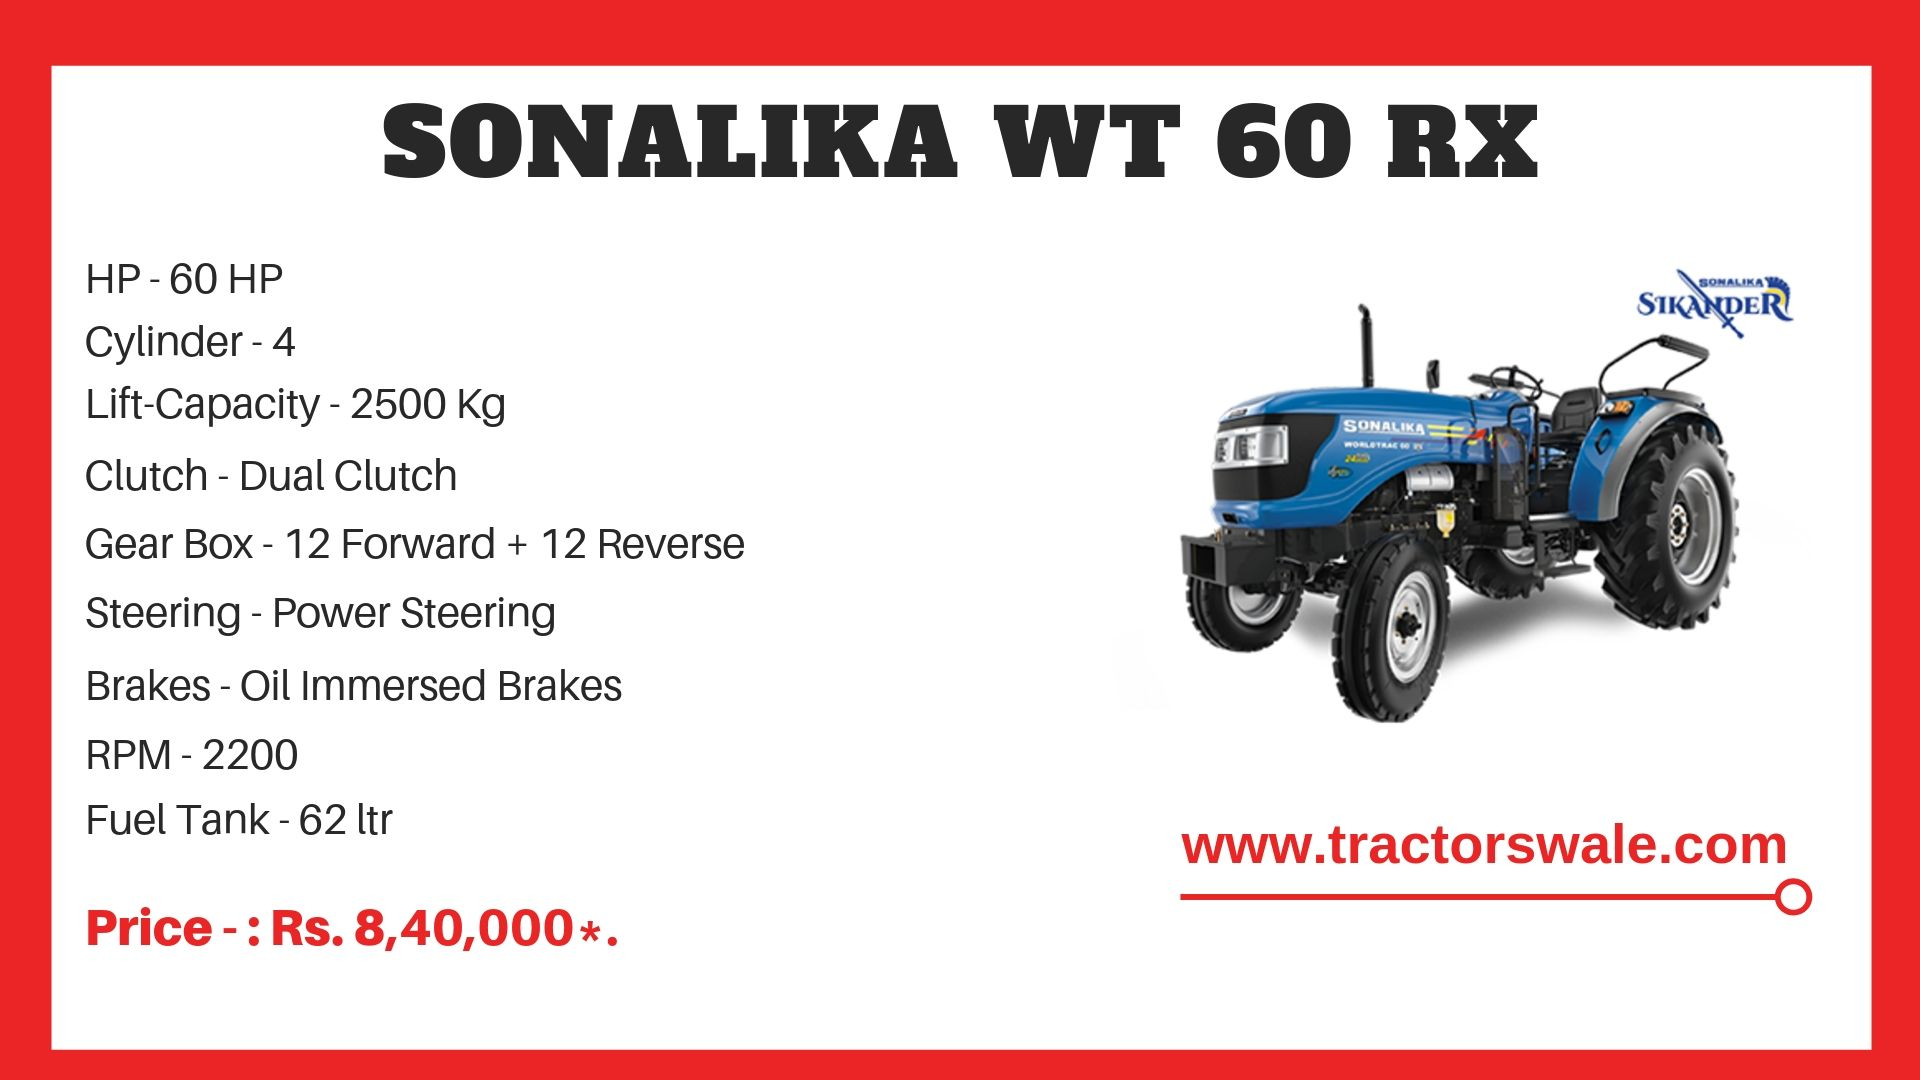 Sonalika WT 60 tractor price